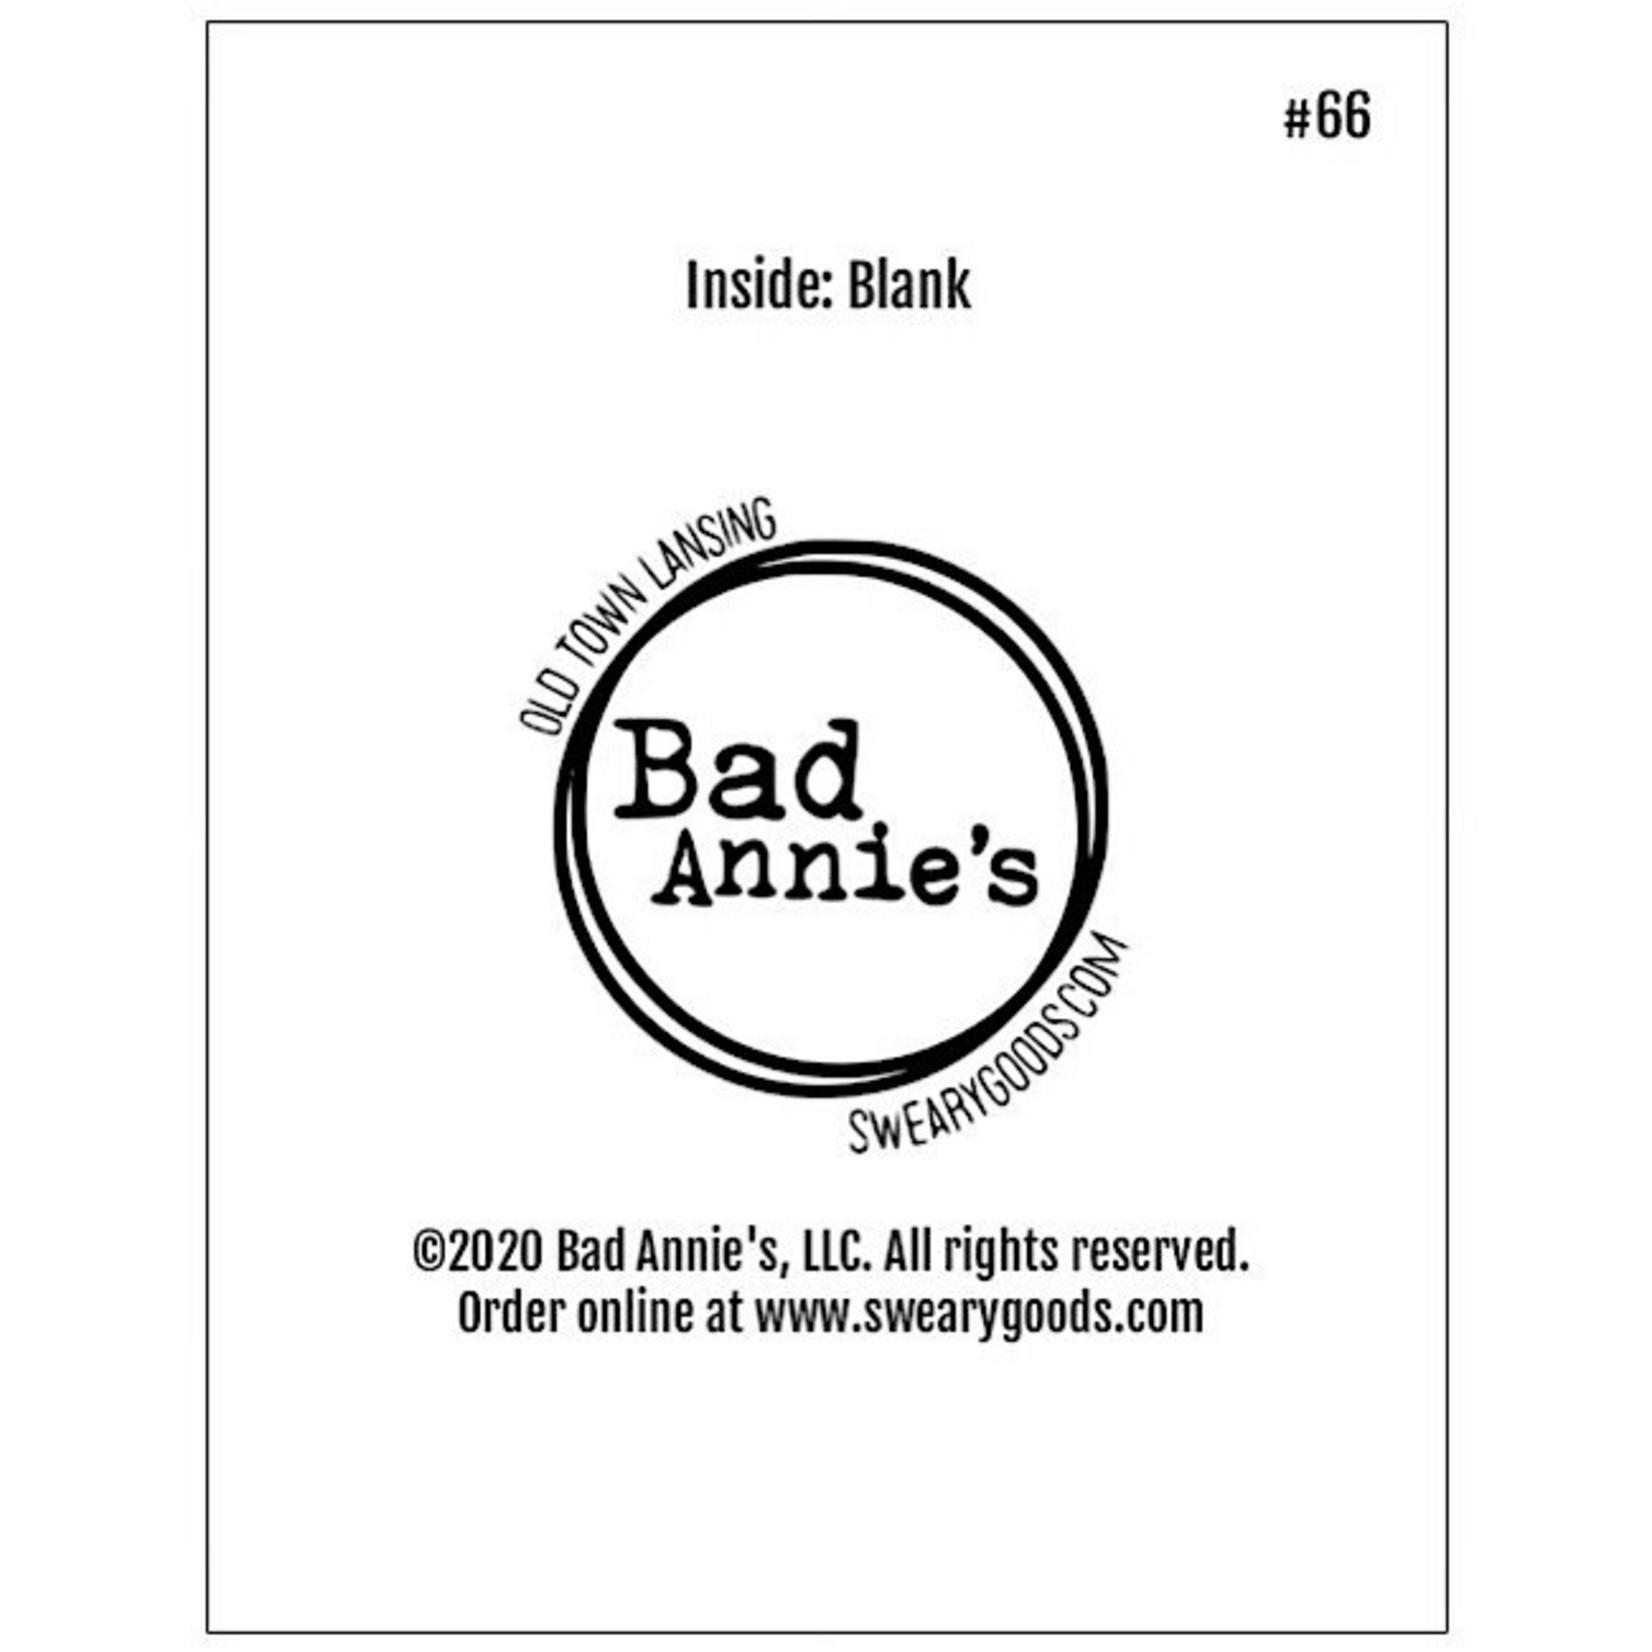 Bad Annie's Card #066 - Clutch My Pearls